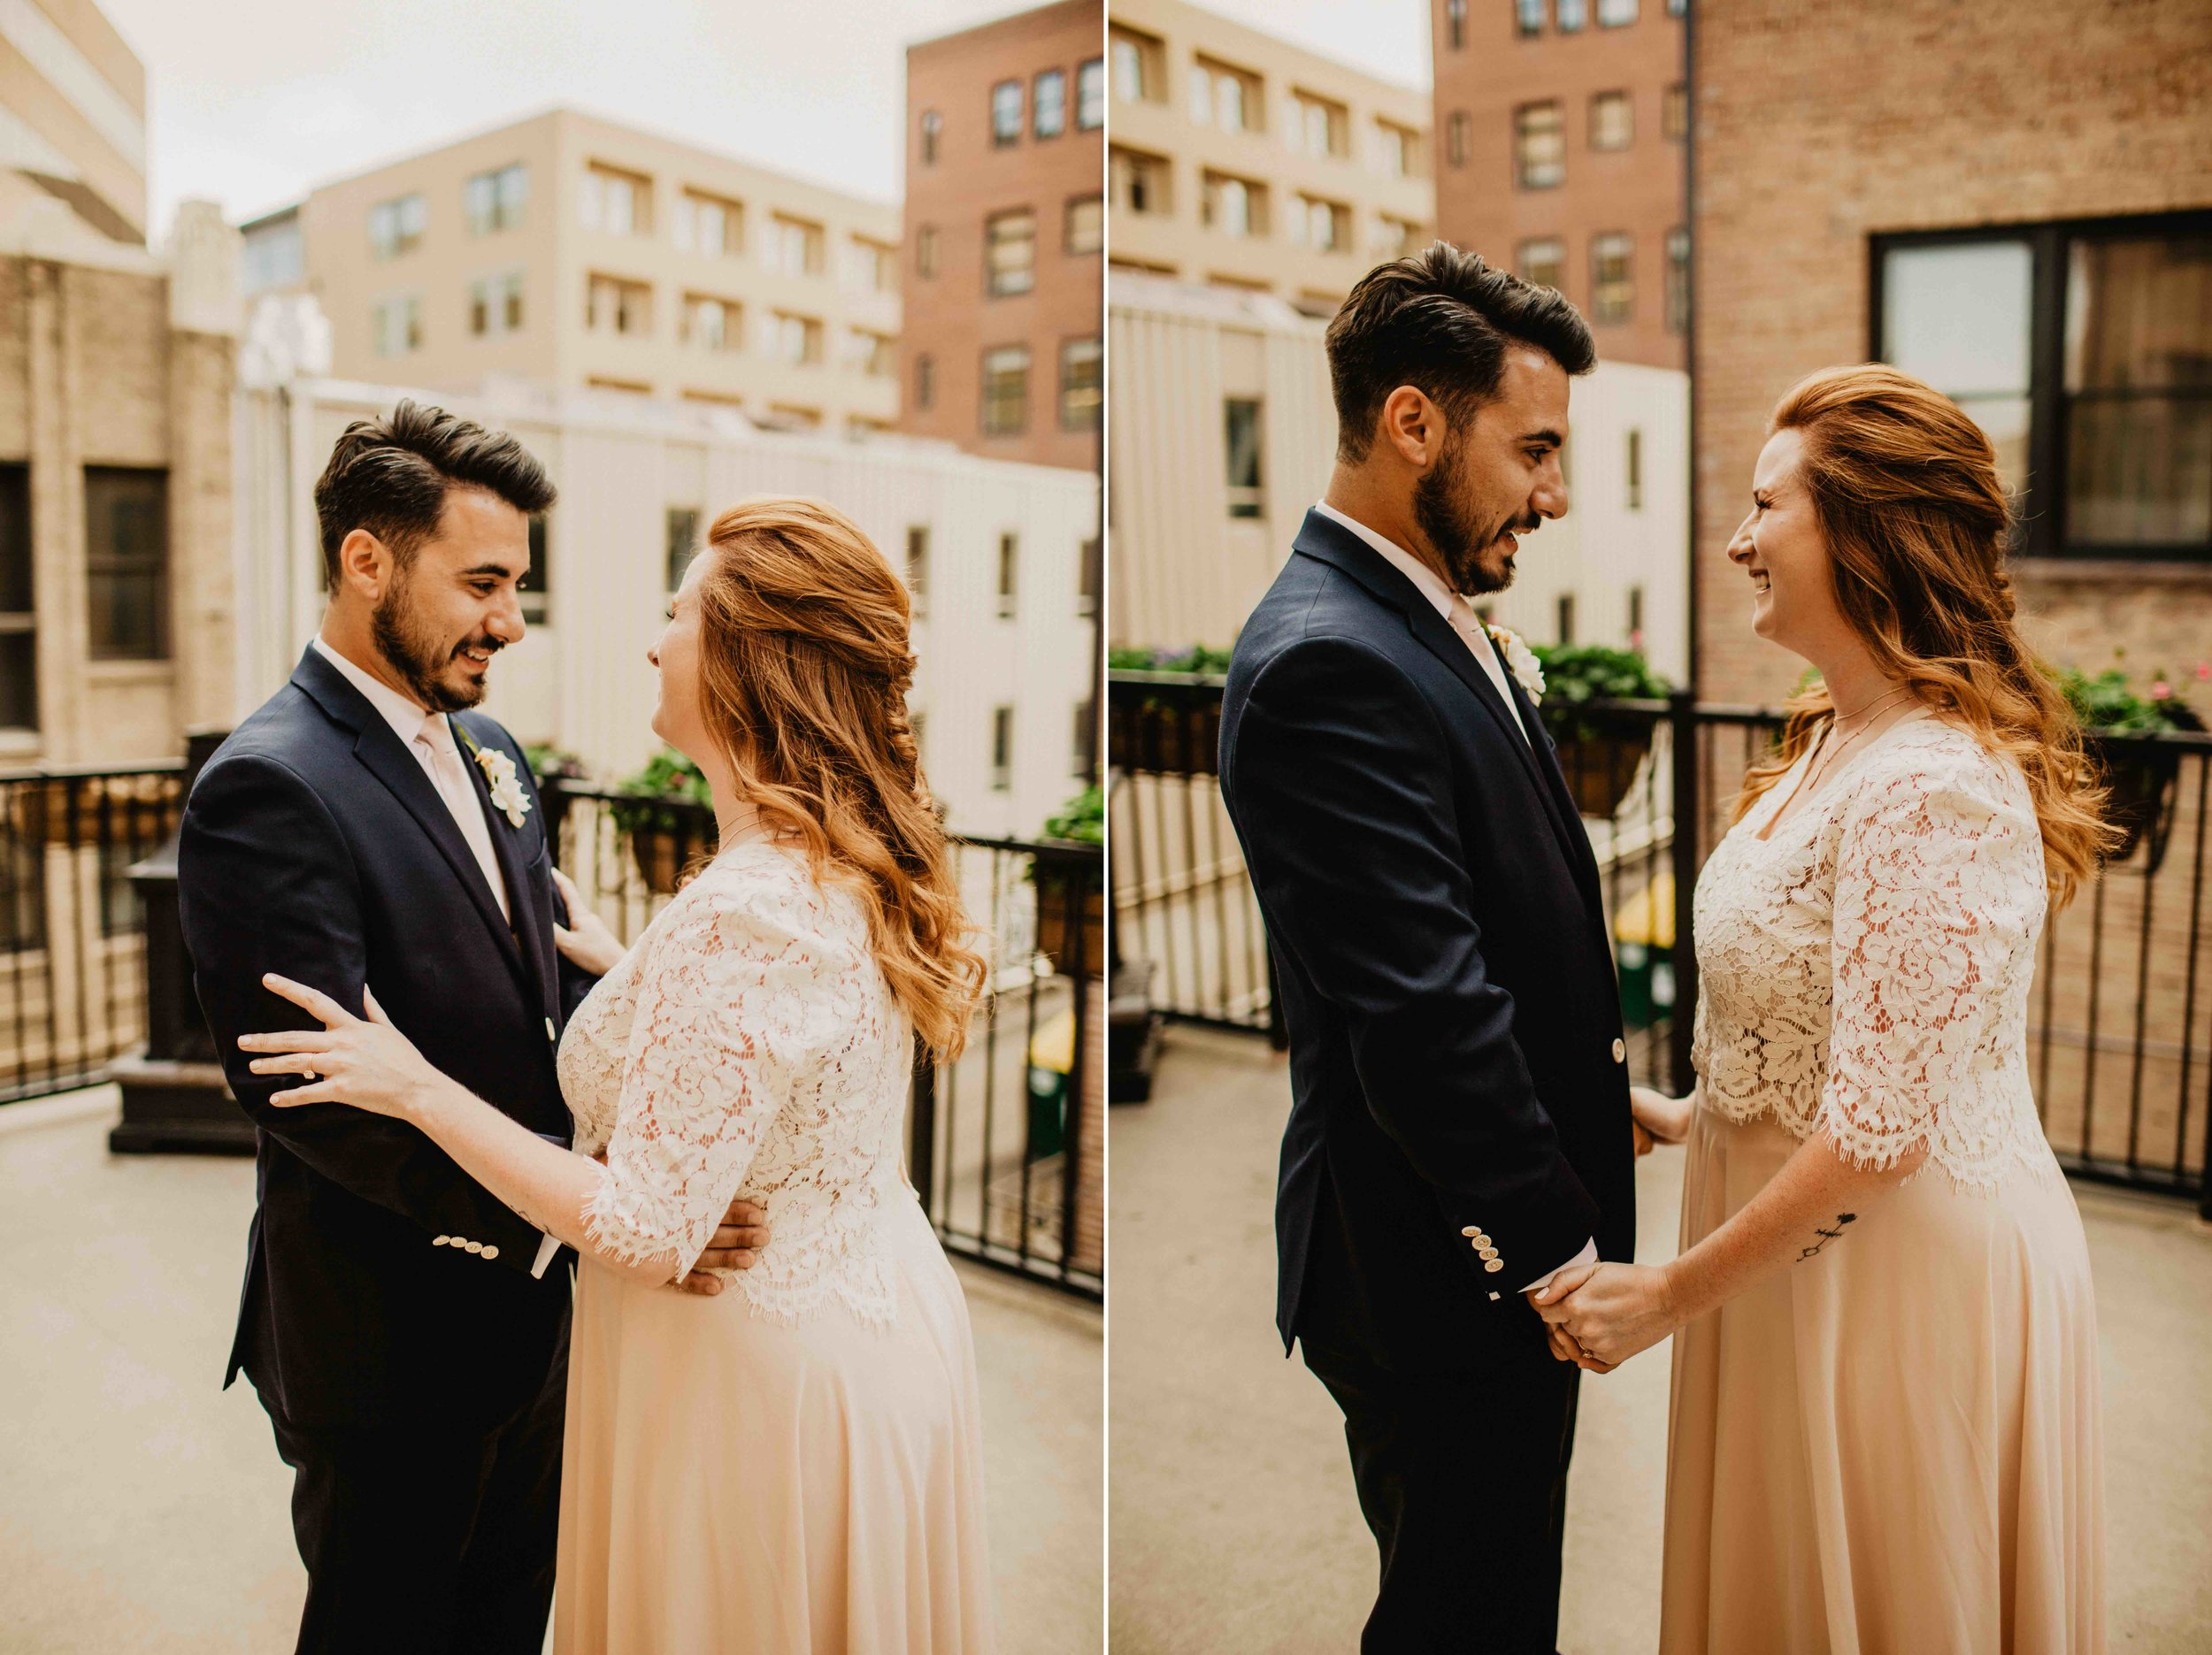 -colorado-wedding-photographer-denver-springs-vail-607A3670.jpeg